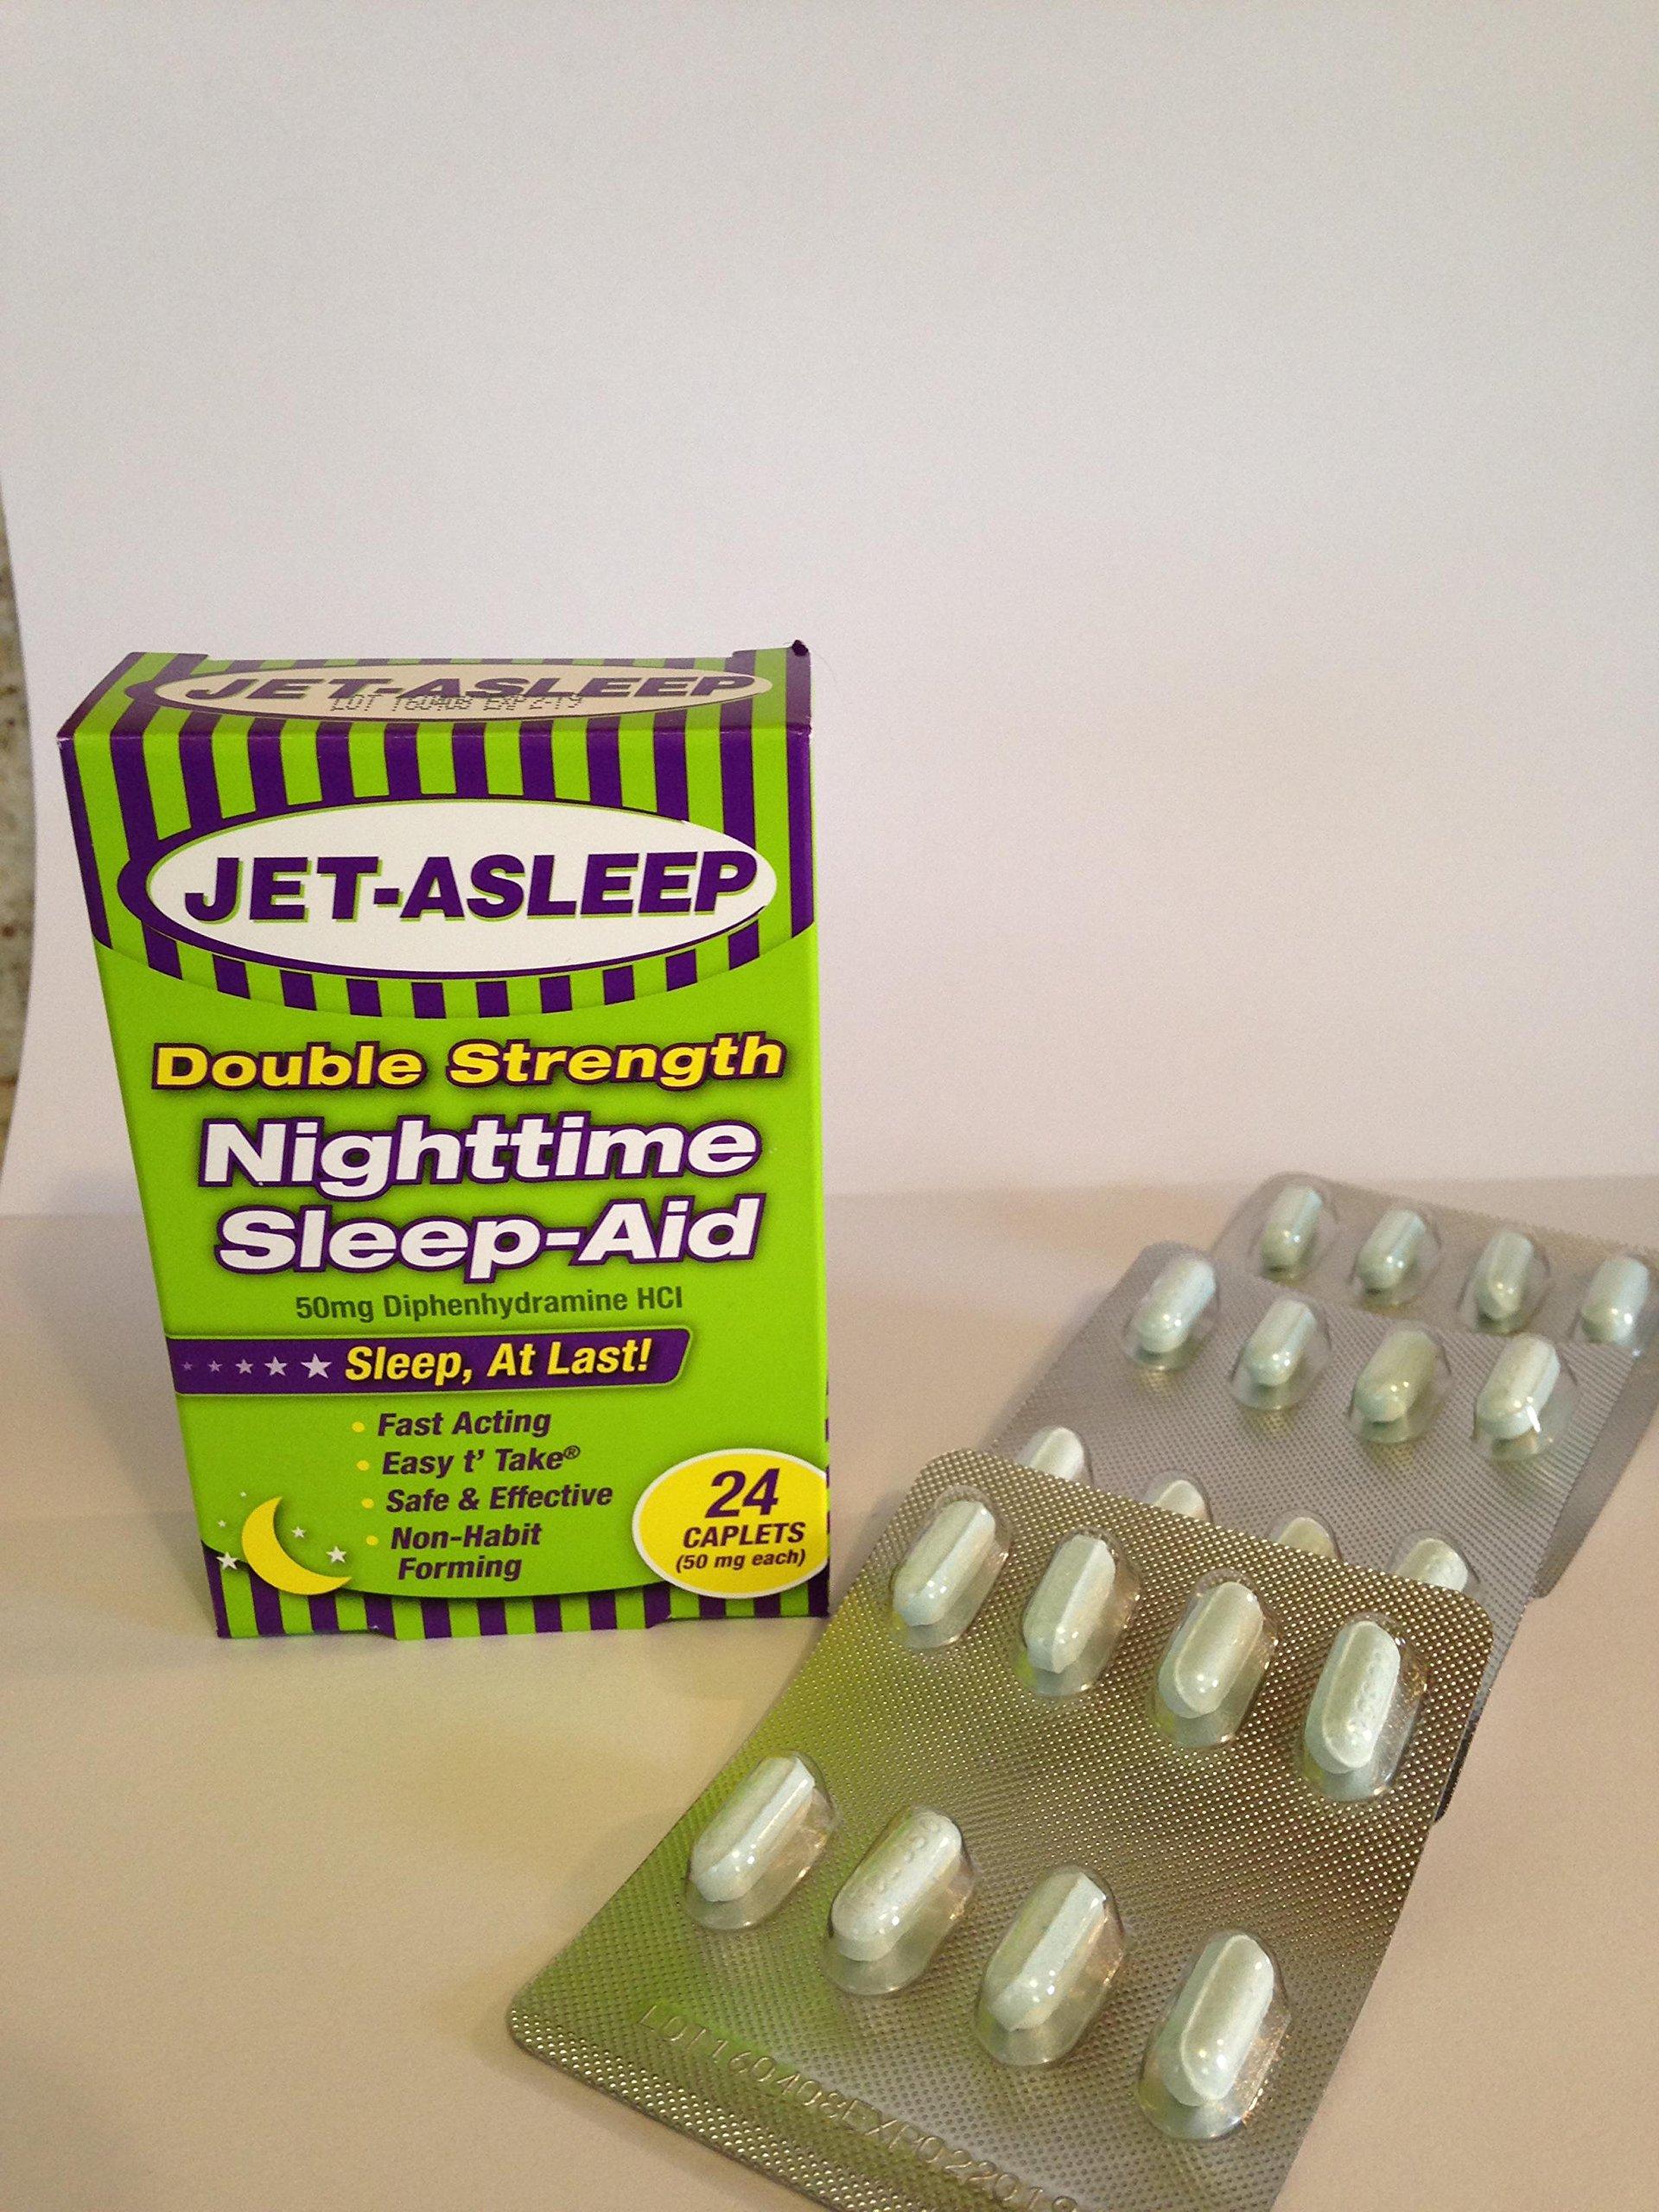 Jet-Asleep Double Strength Nighttime Sleep-Aid 24 count